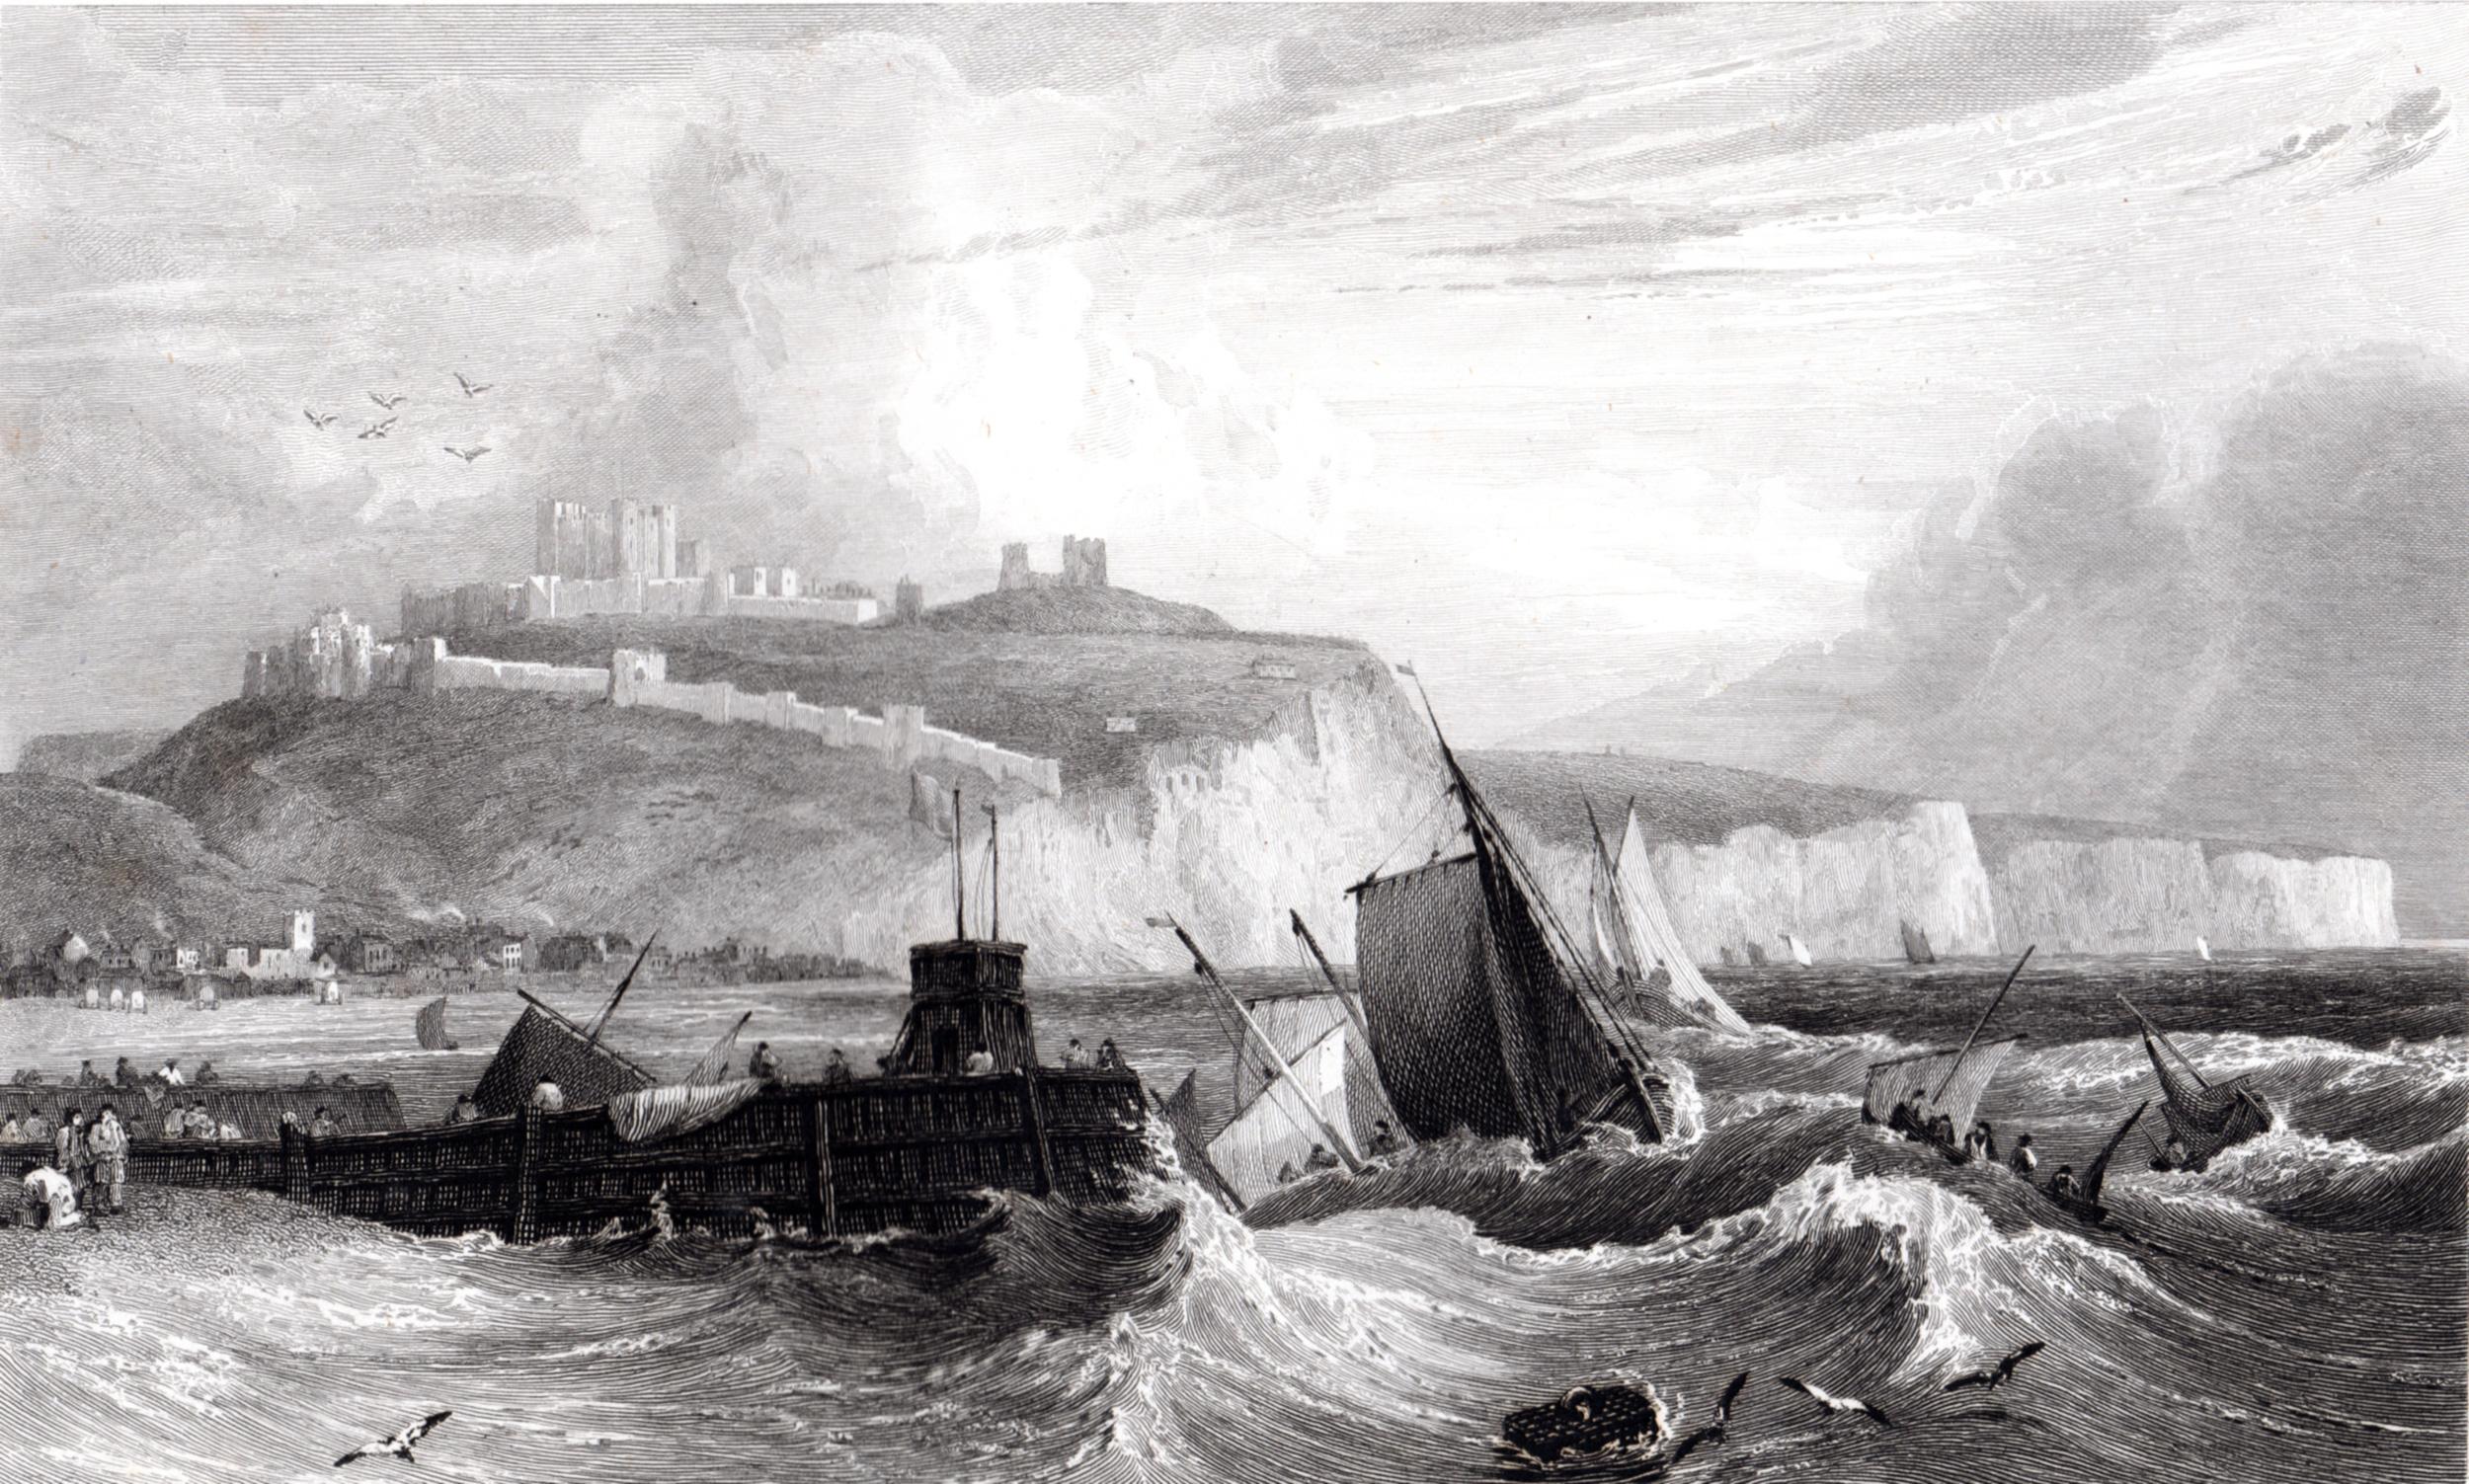 Turner, J.M.W. / Southern Coast of England